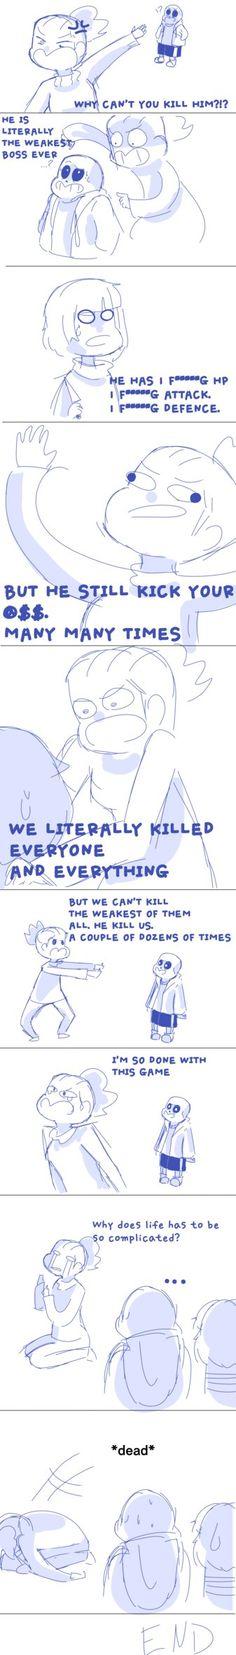 Undertale random comic